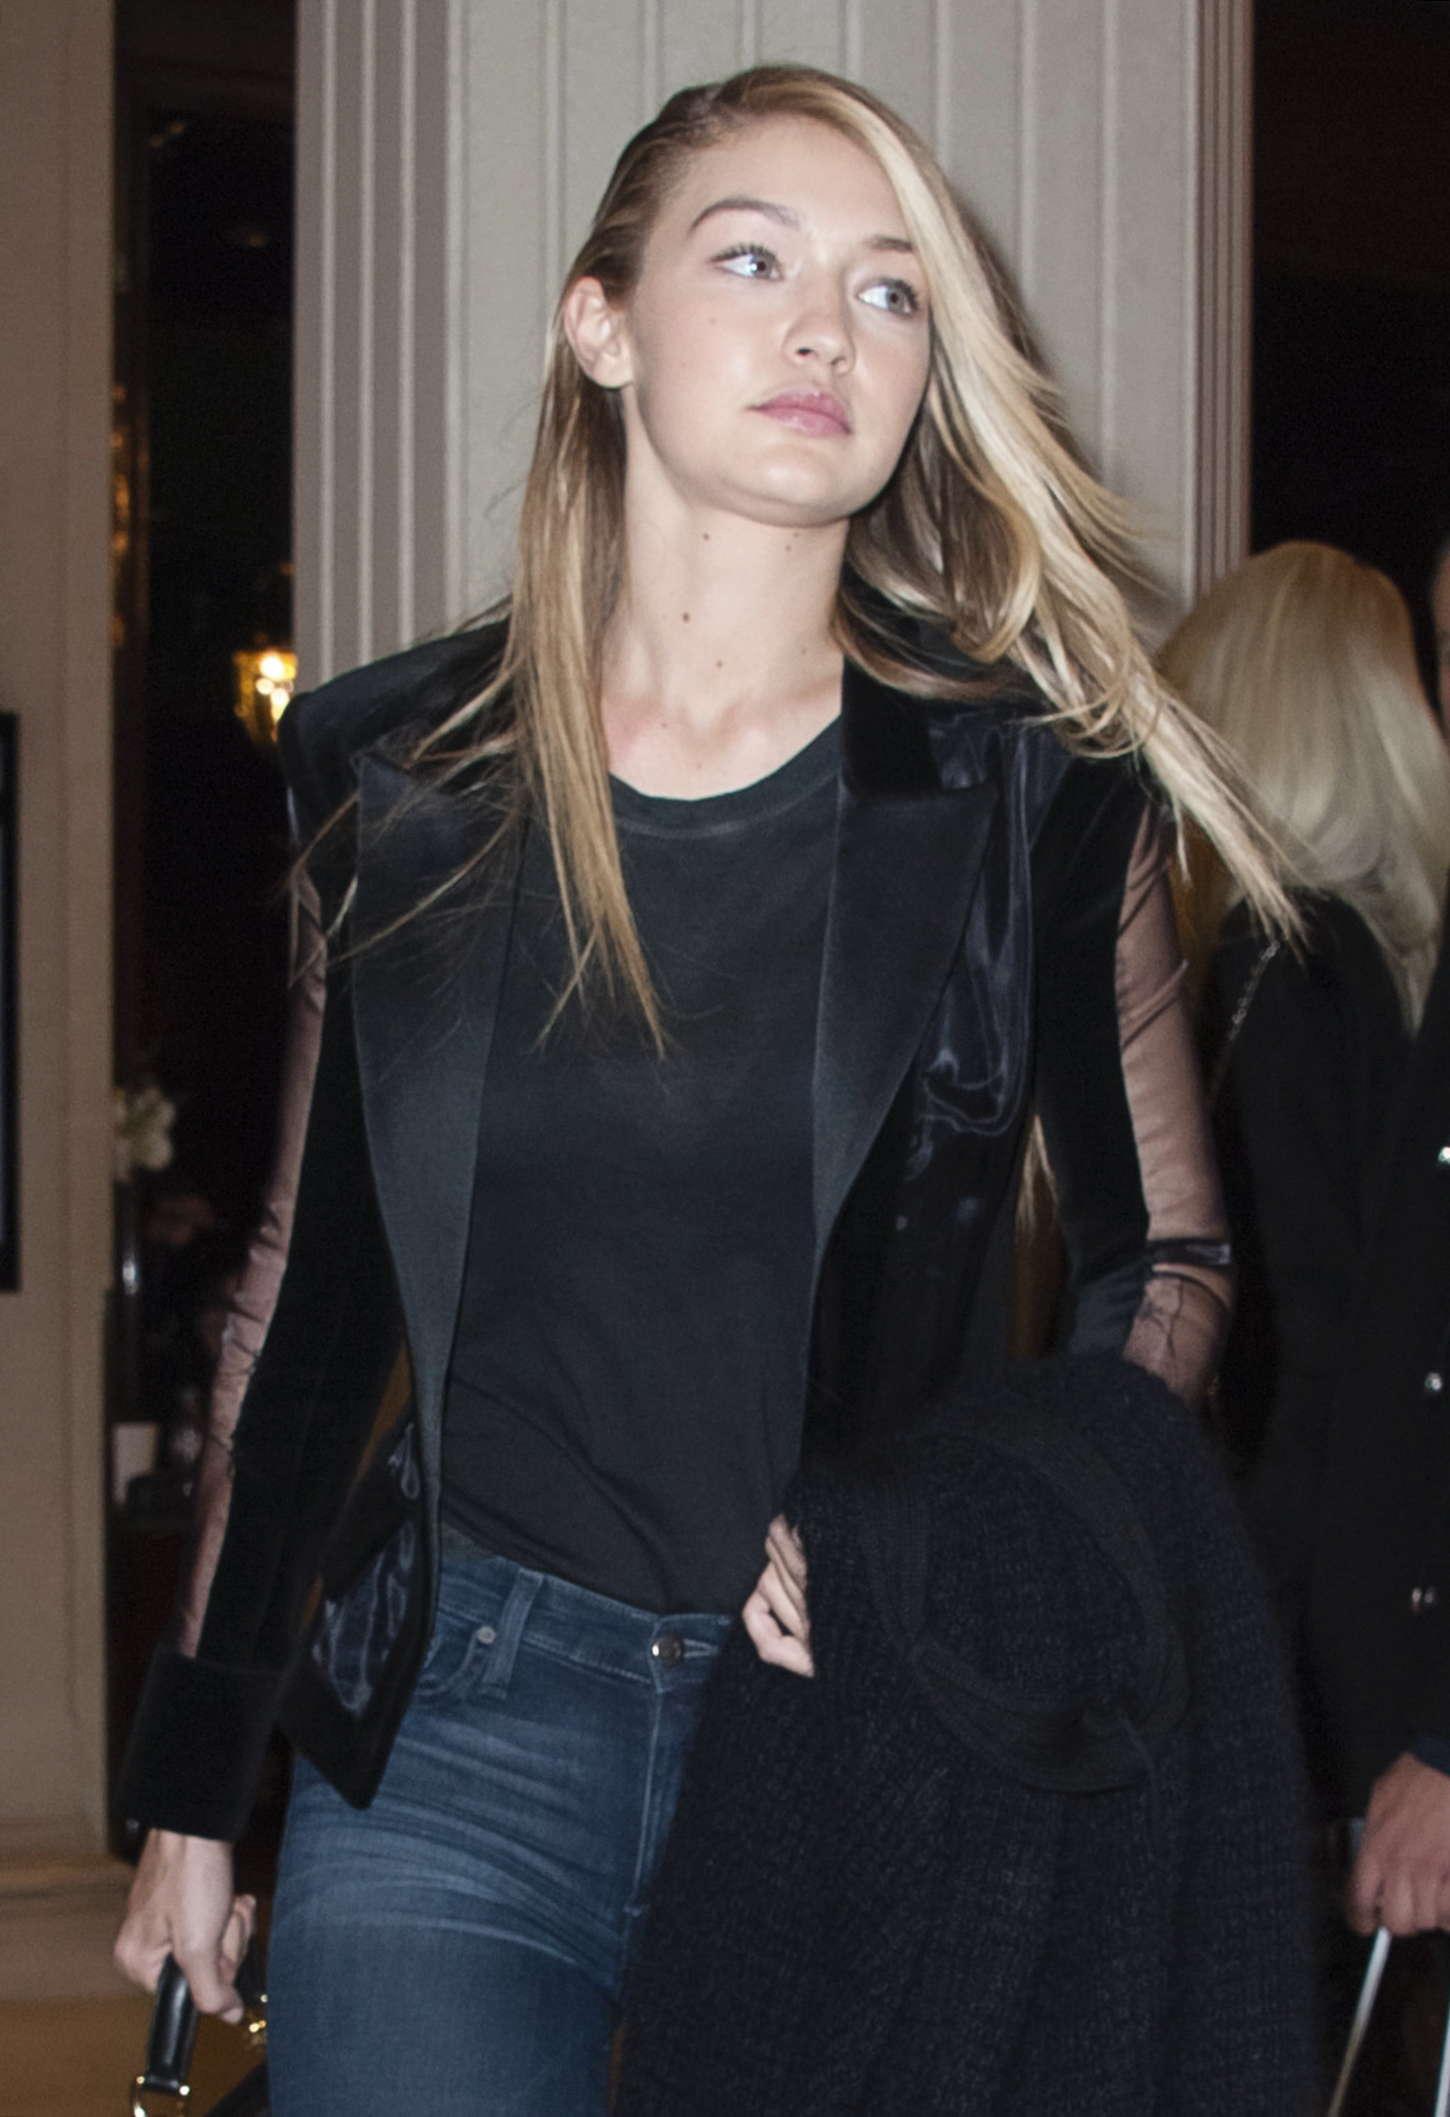 Gigi hadid at paris fashion week 2015 09 gotceleb for Gigi hadid fashion week